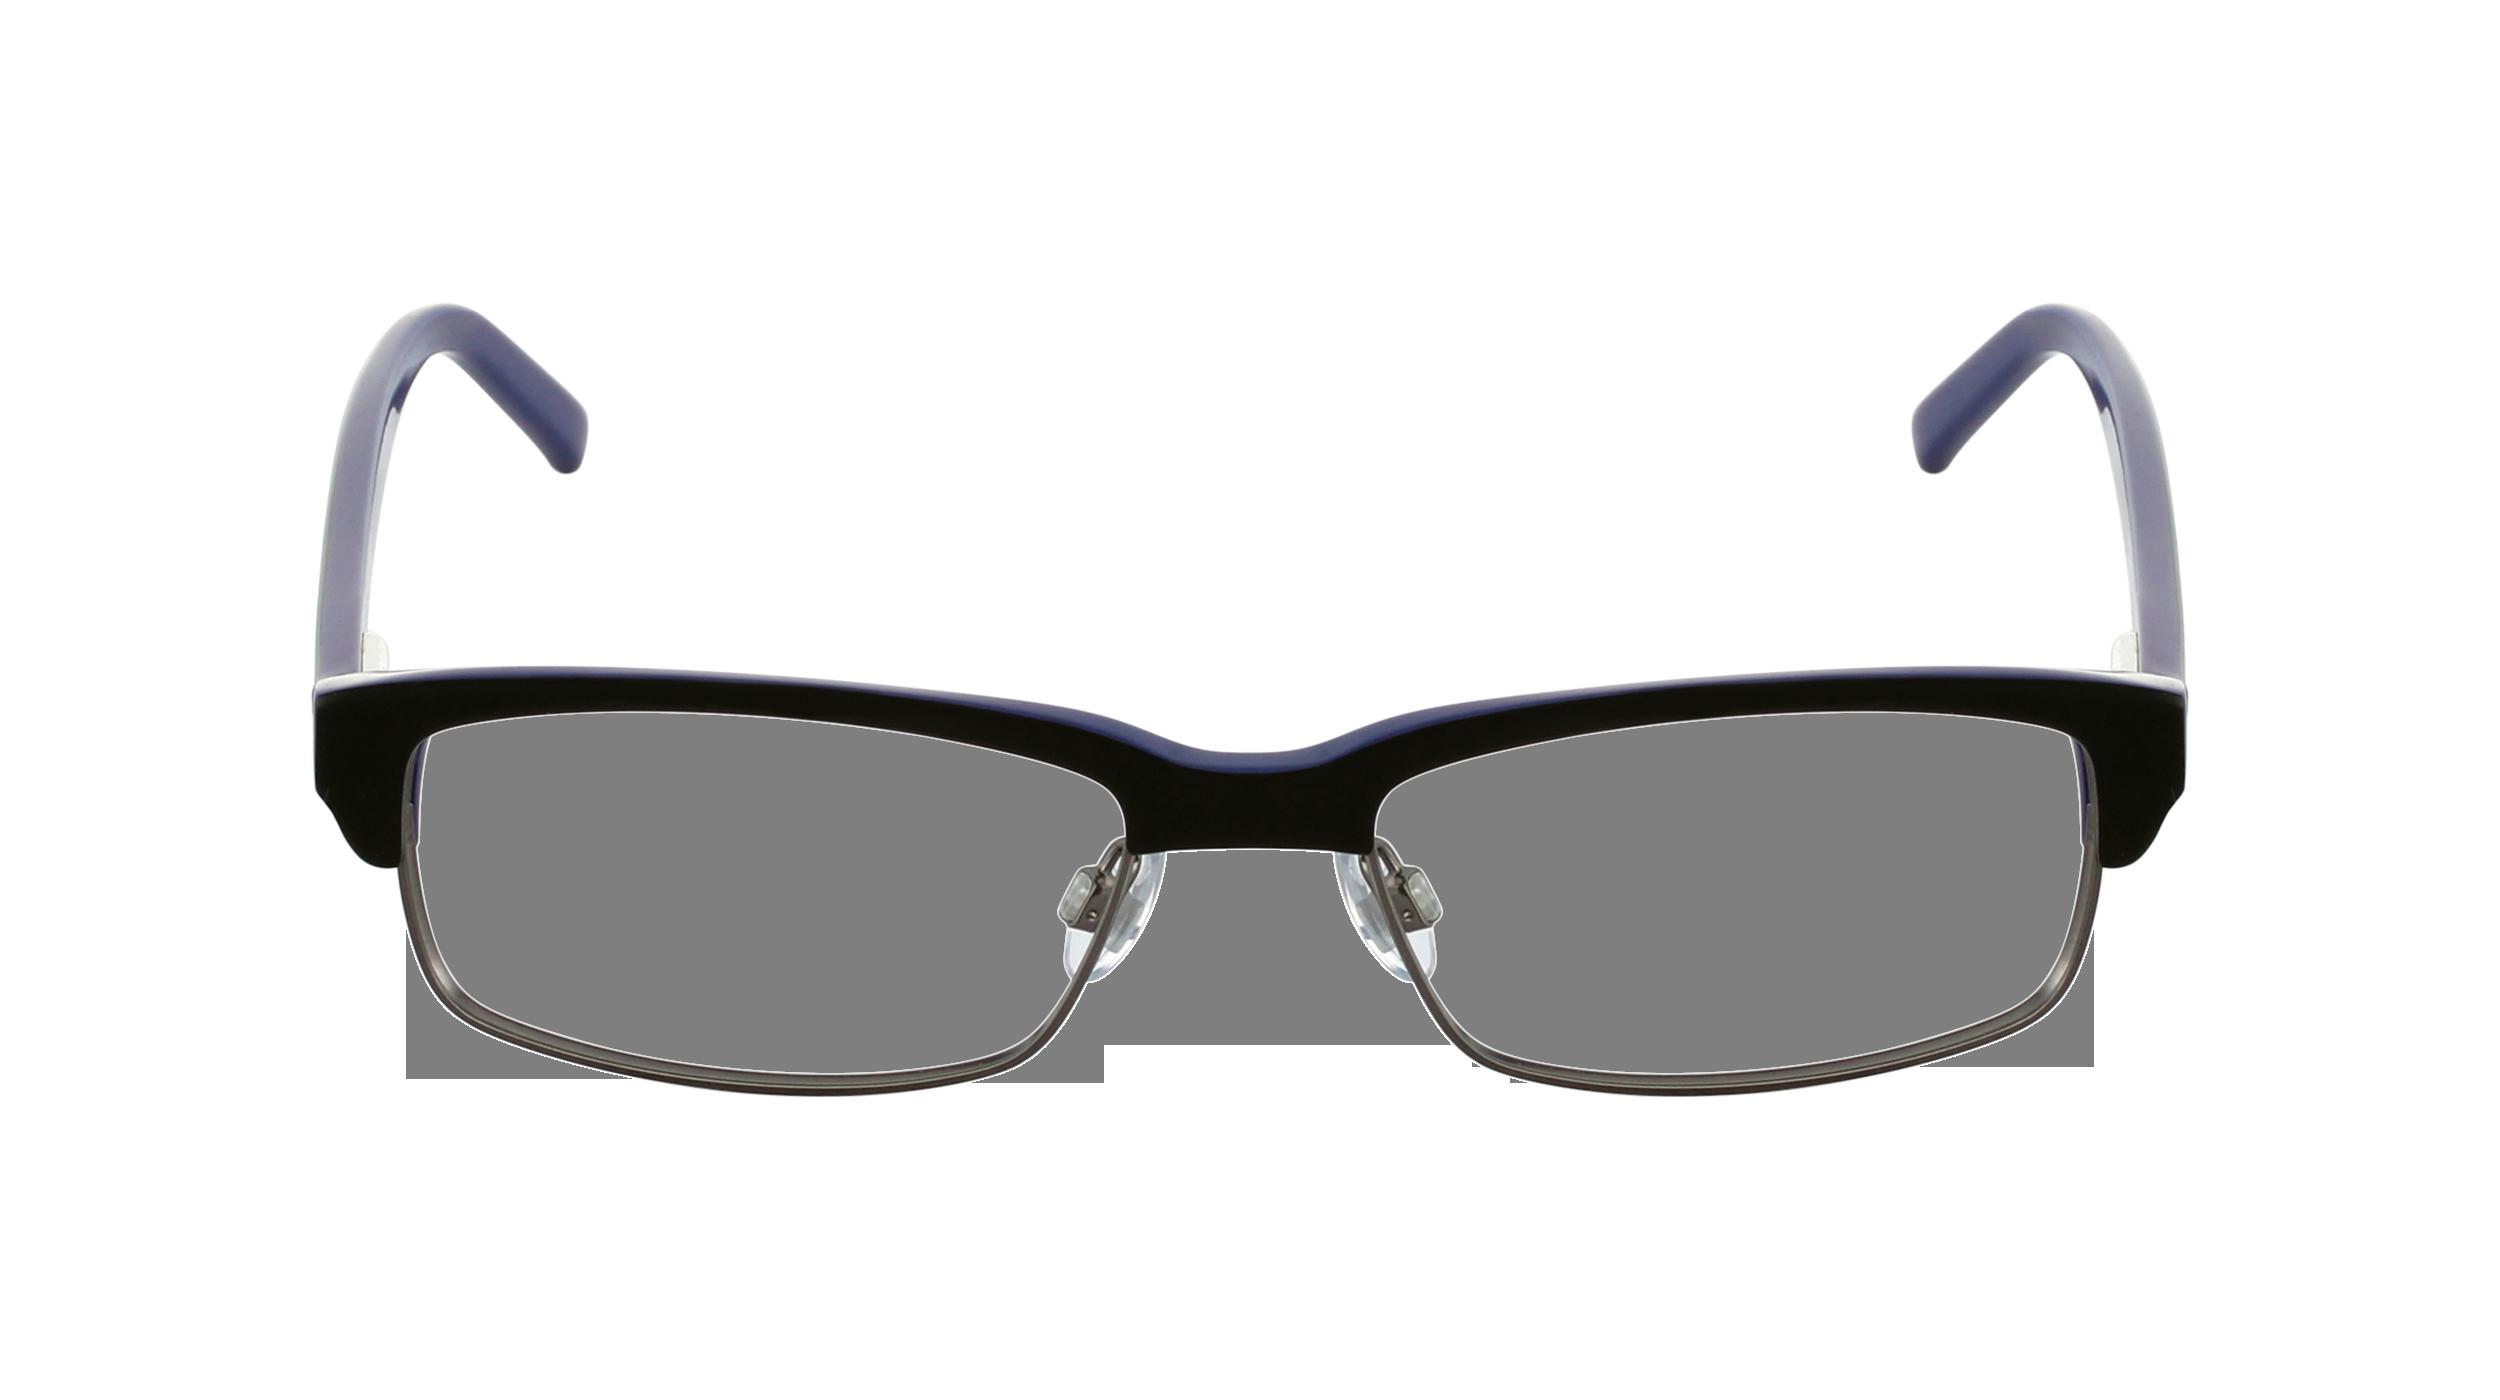 Izod Eyeglasses Frames - oukas.info